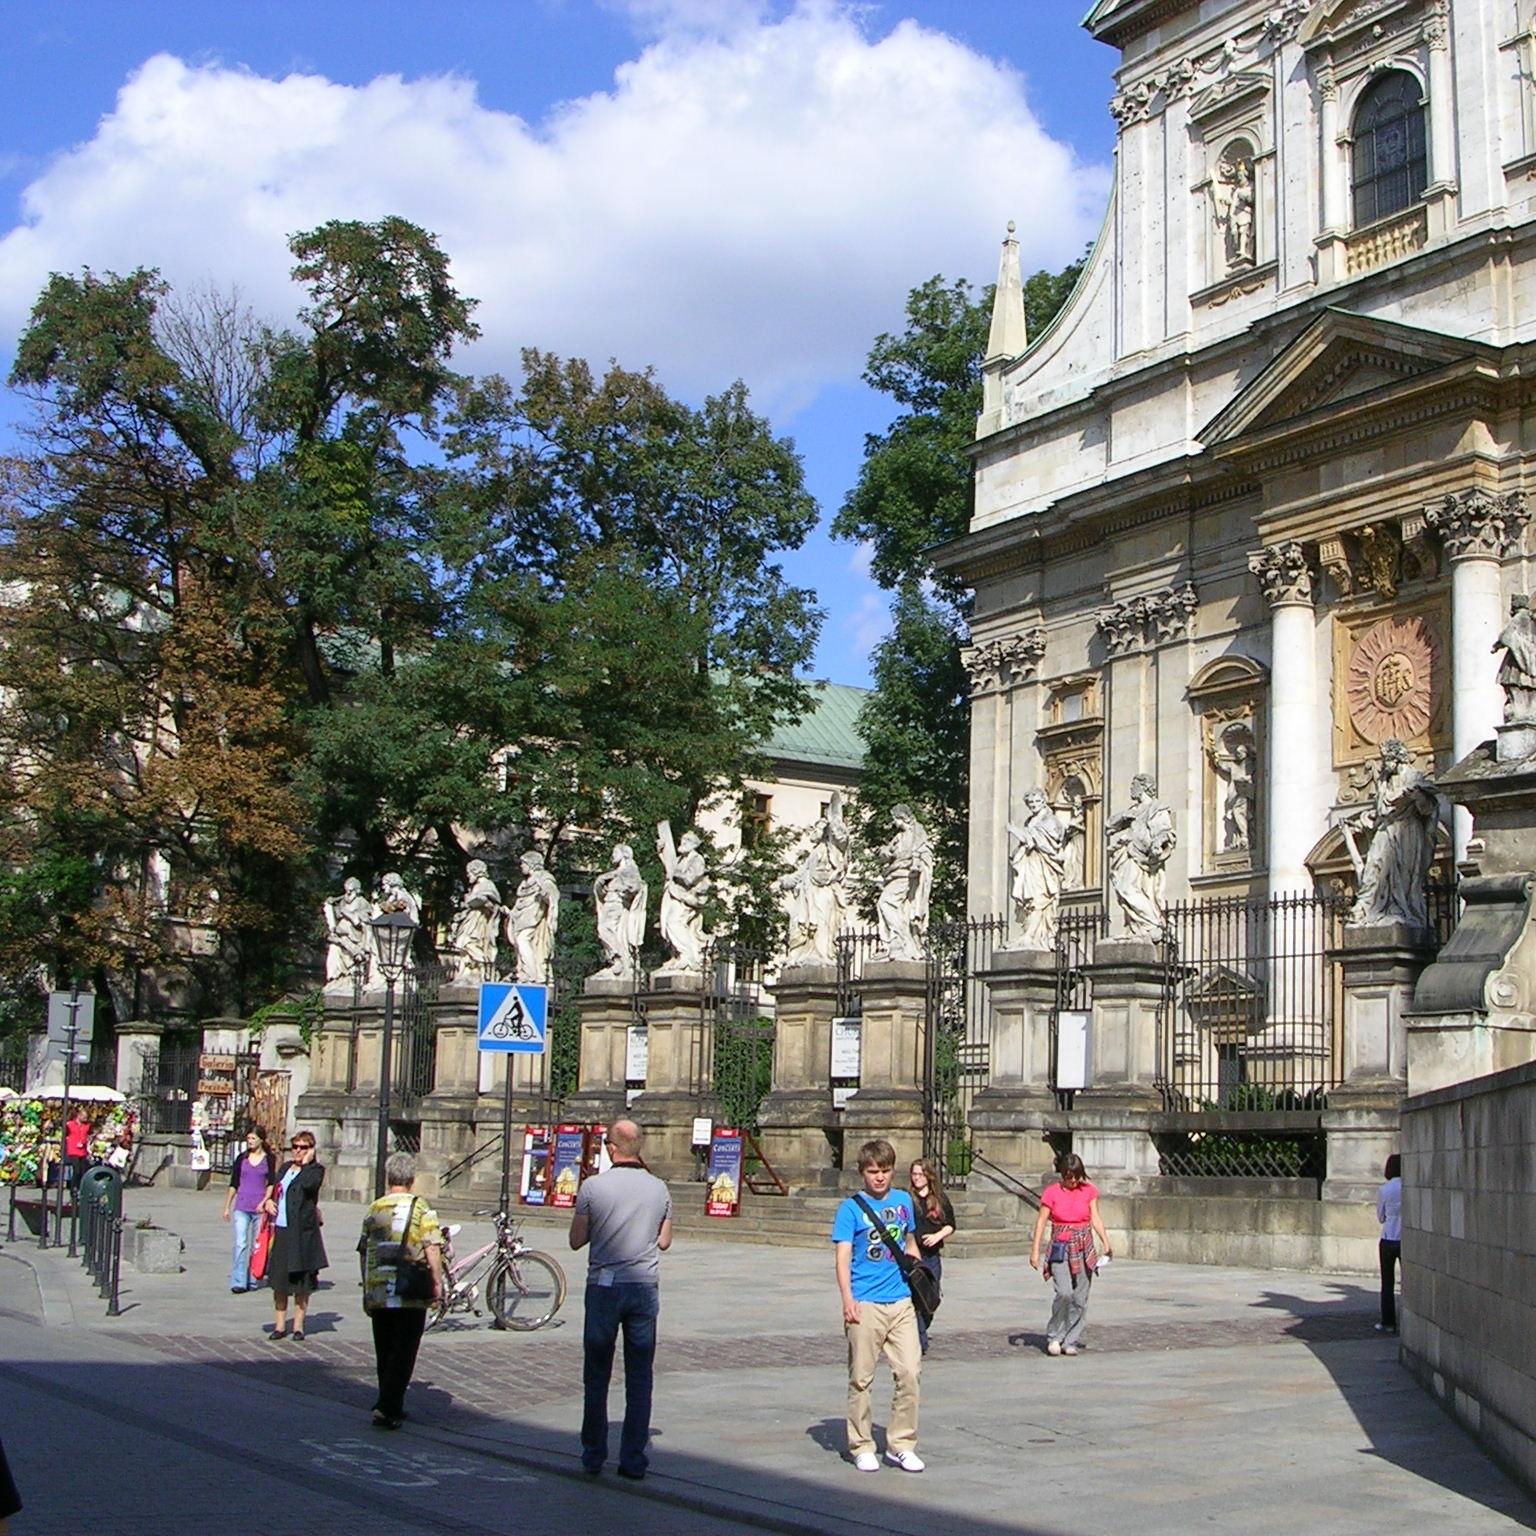 Krakow by The Doubtful Traveller